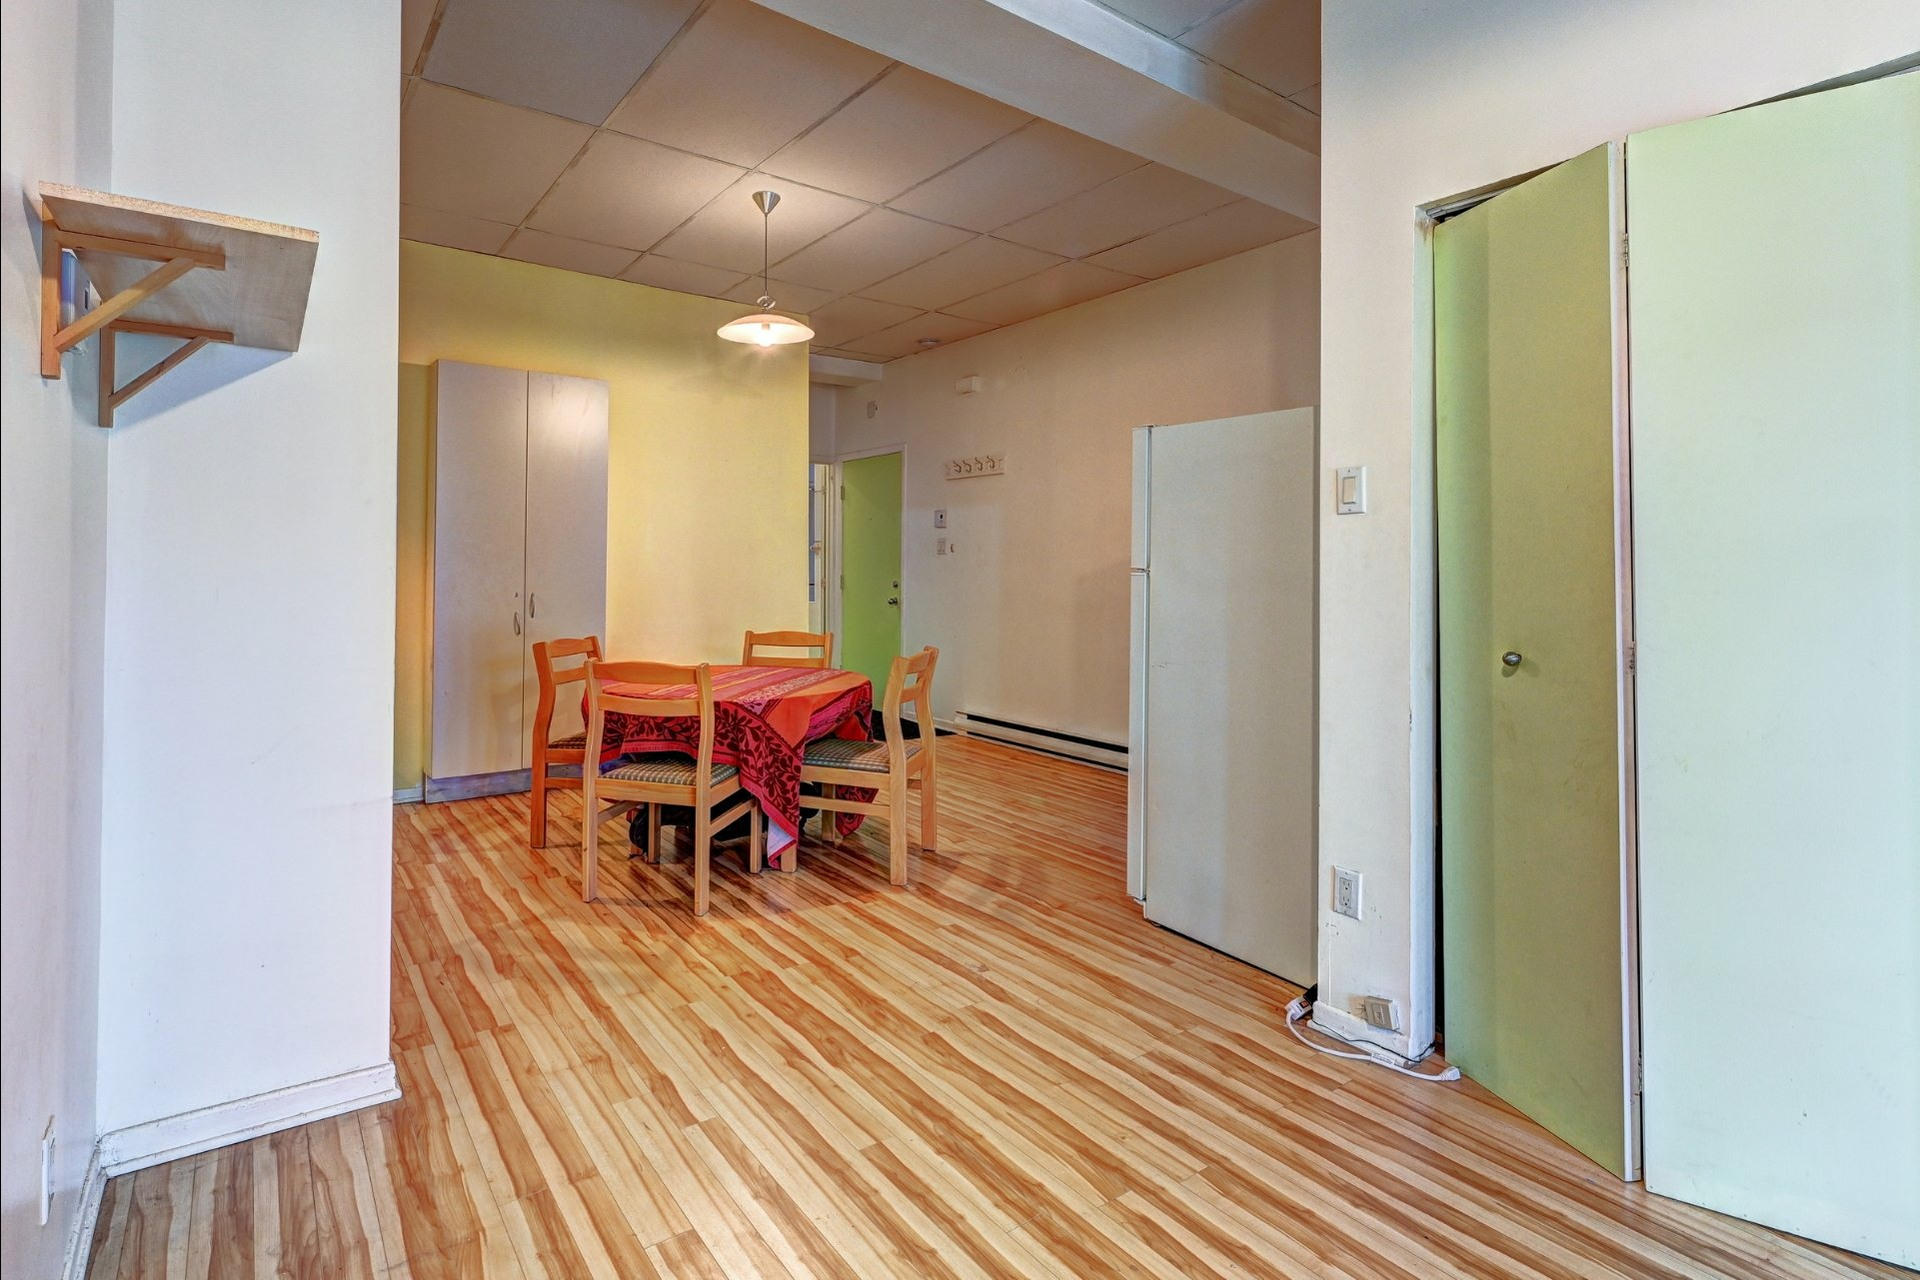 image 4 - Departamento Para alquiler Ville-Marie Montréal  - 4 habitaciones